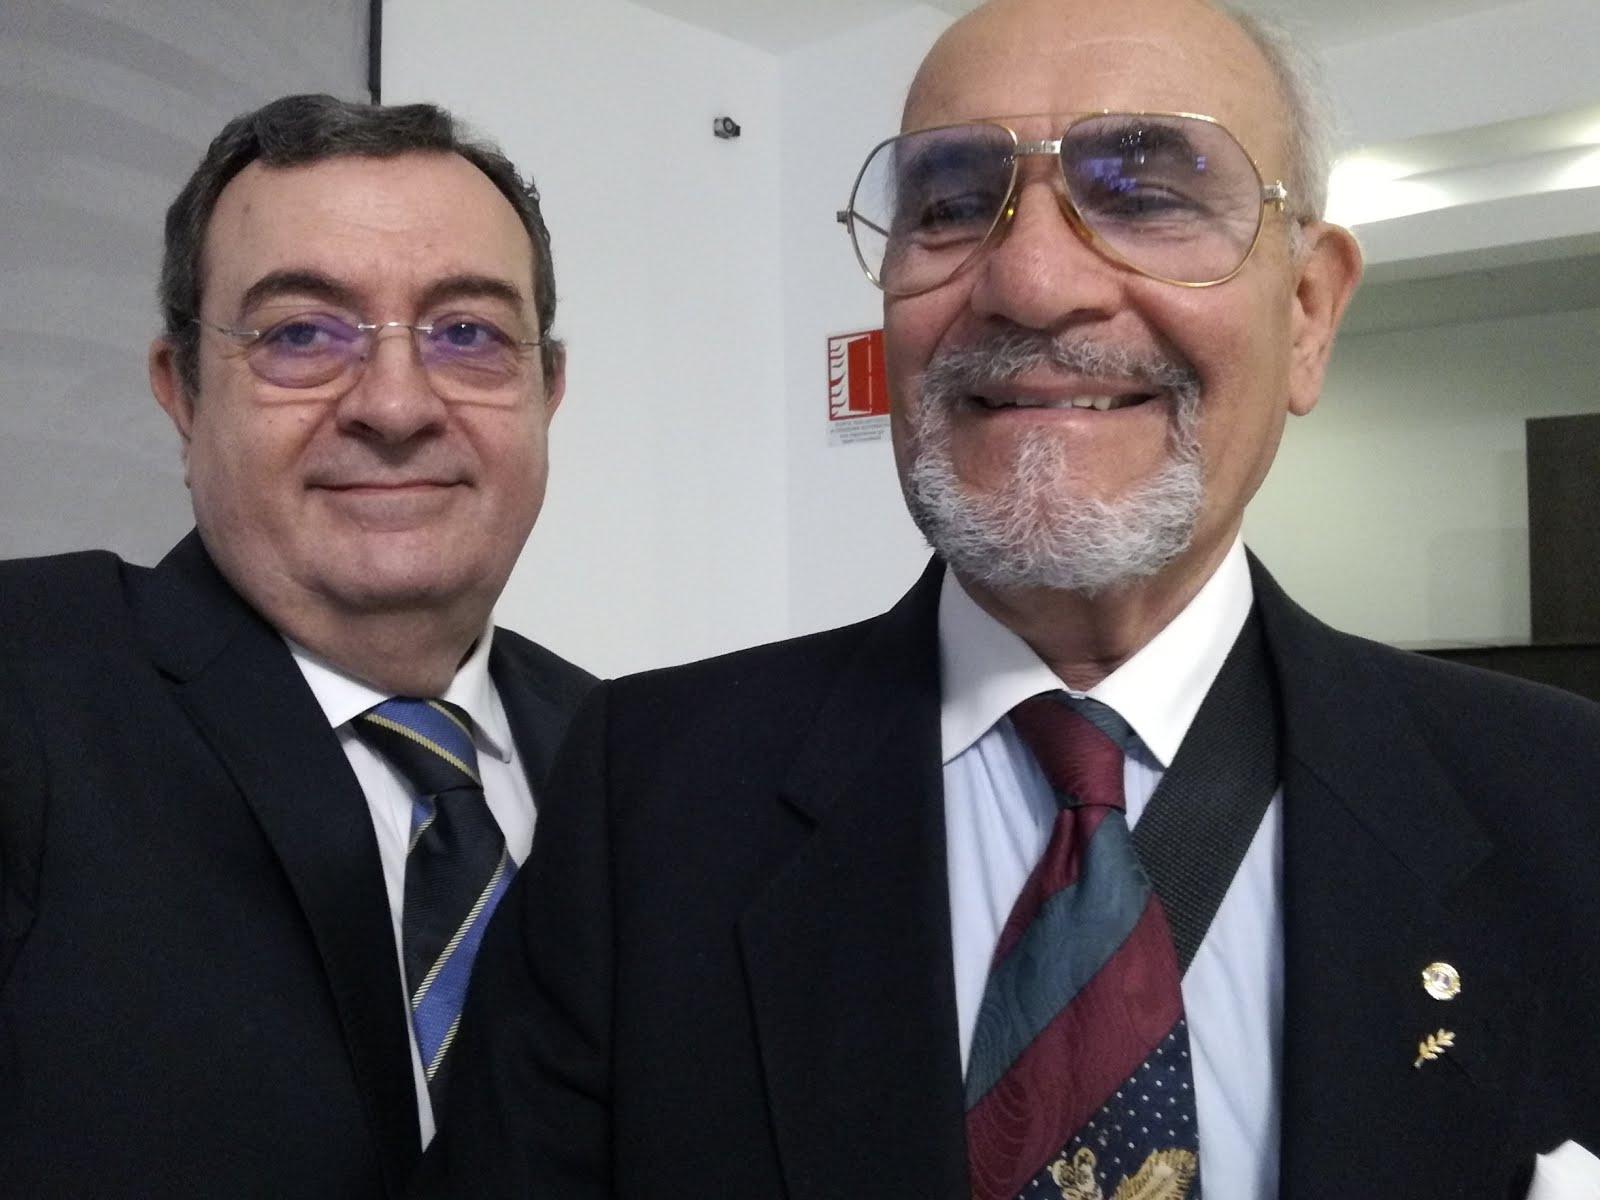 dott. vitale e il dott. mastrorilli